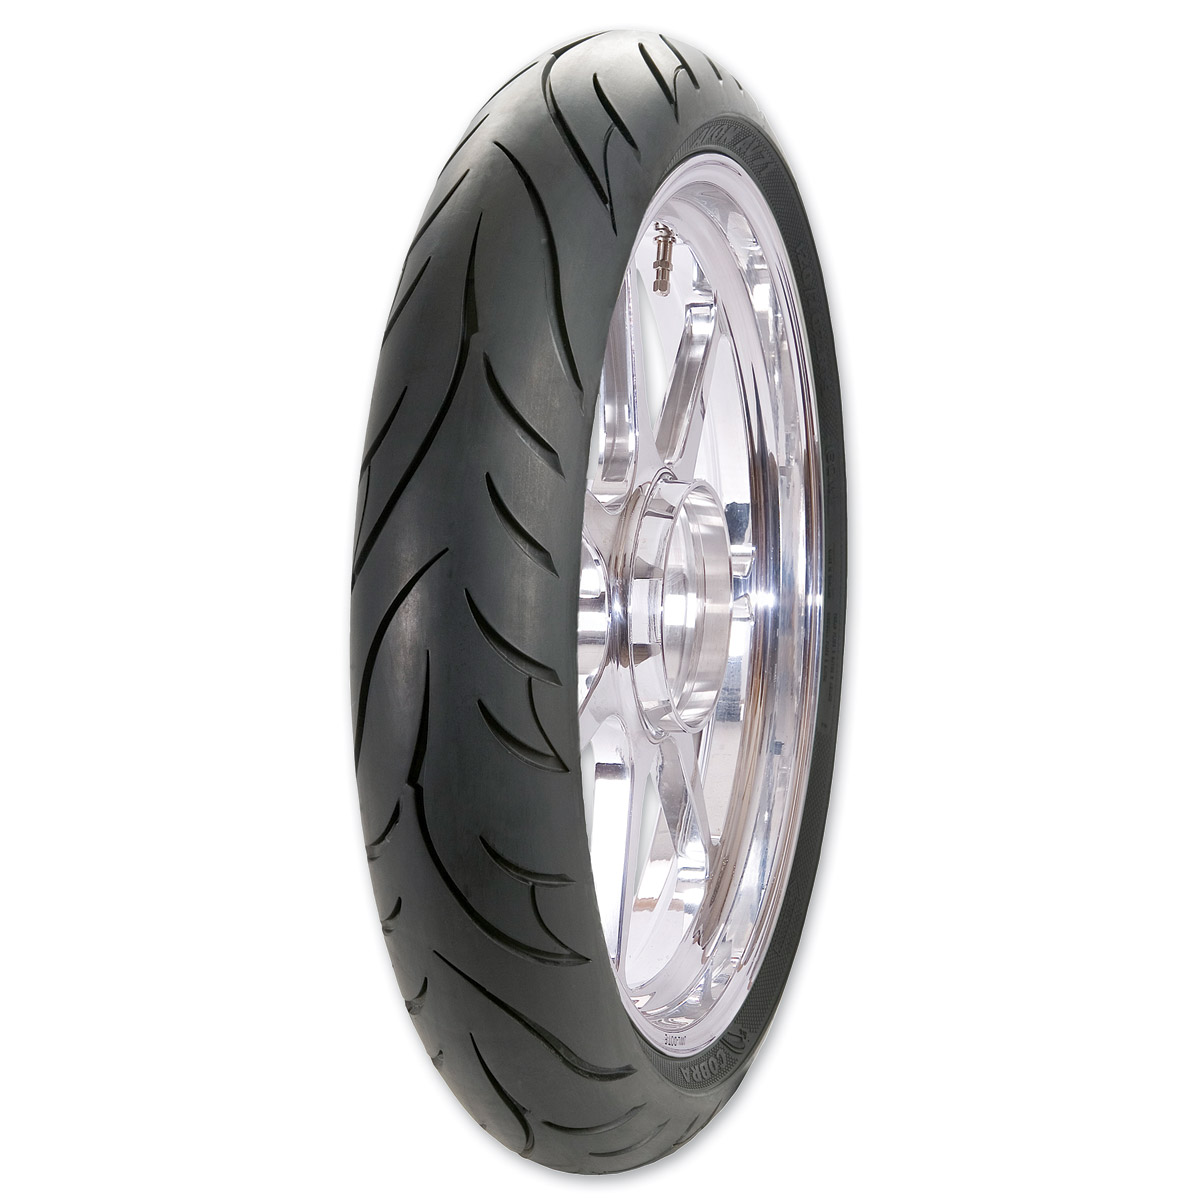 Suzuki Raider J Pro Spec And Price: Avon AV71 Cobra 150/80R17 Front Tire